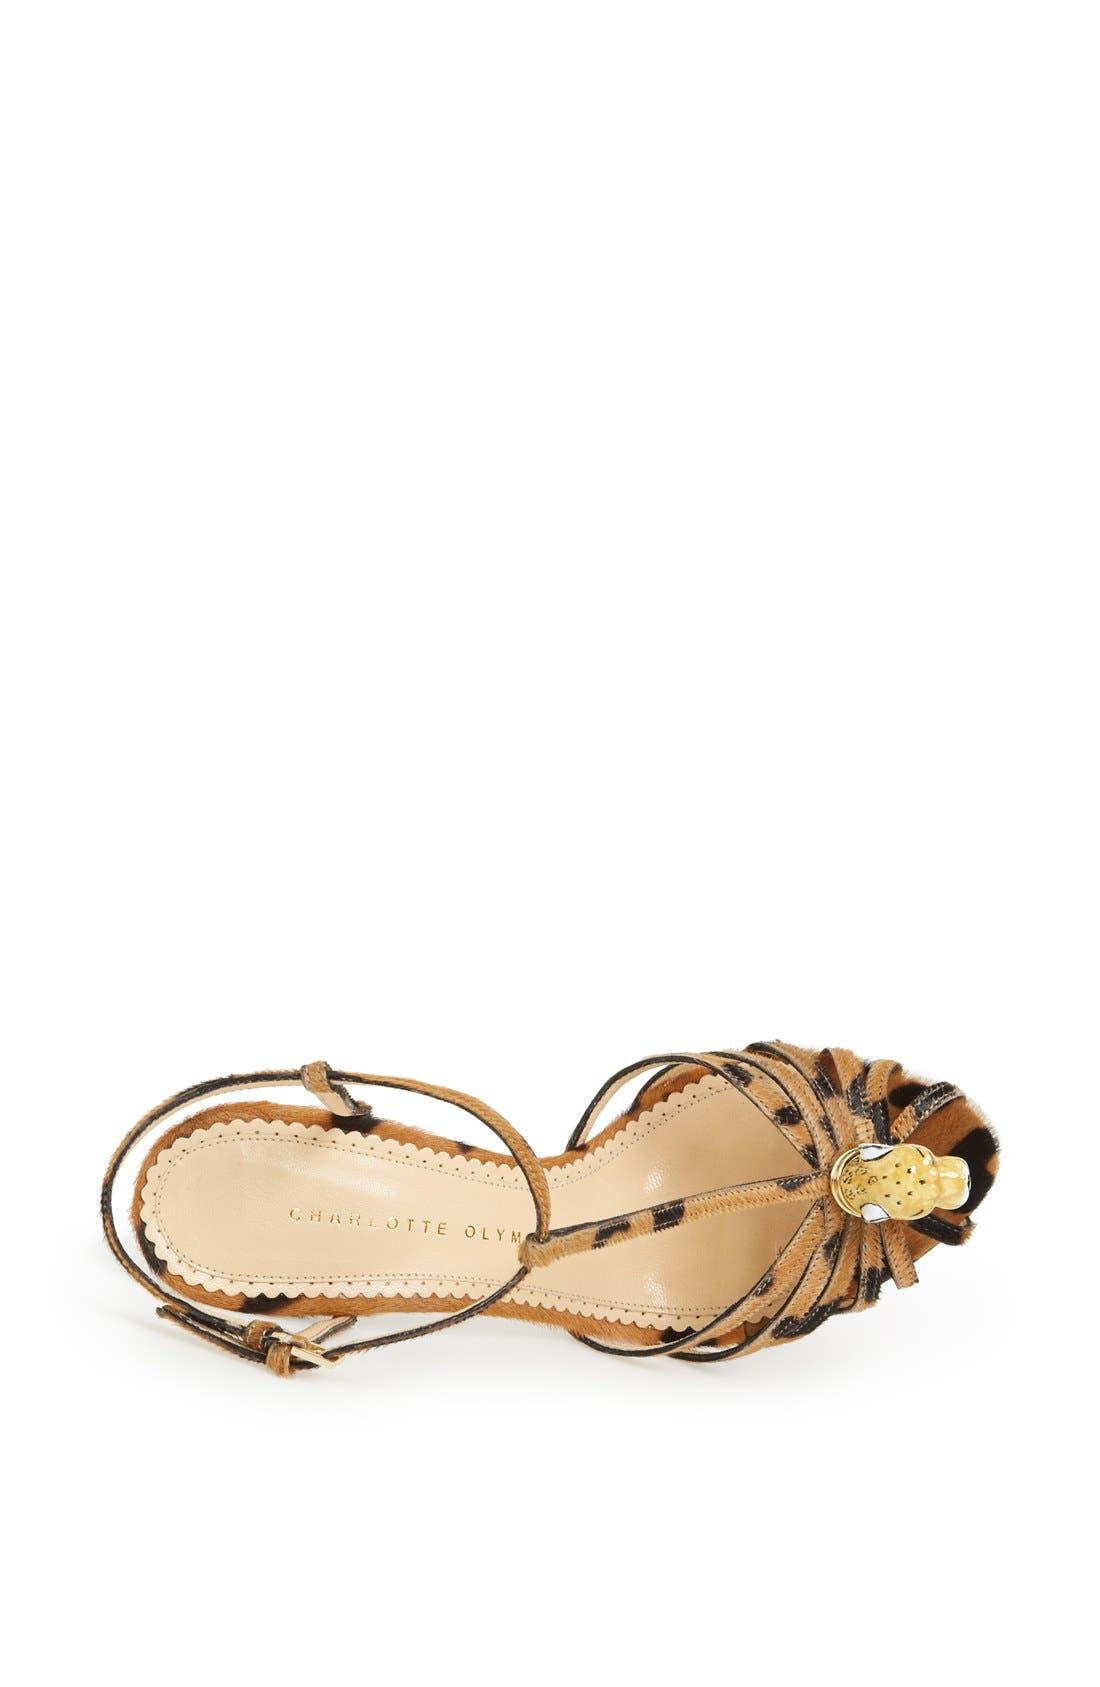 Alternate Image 3  - Charlotte Olympia 'Clio' Calf Hair Sandal